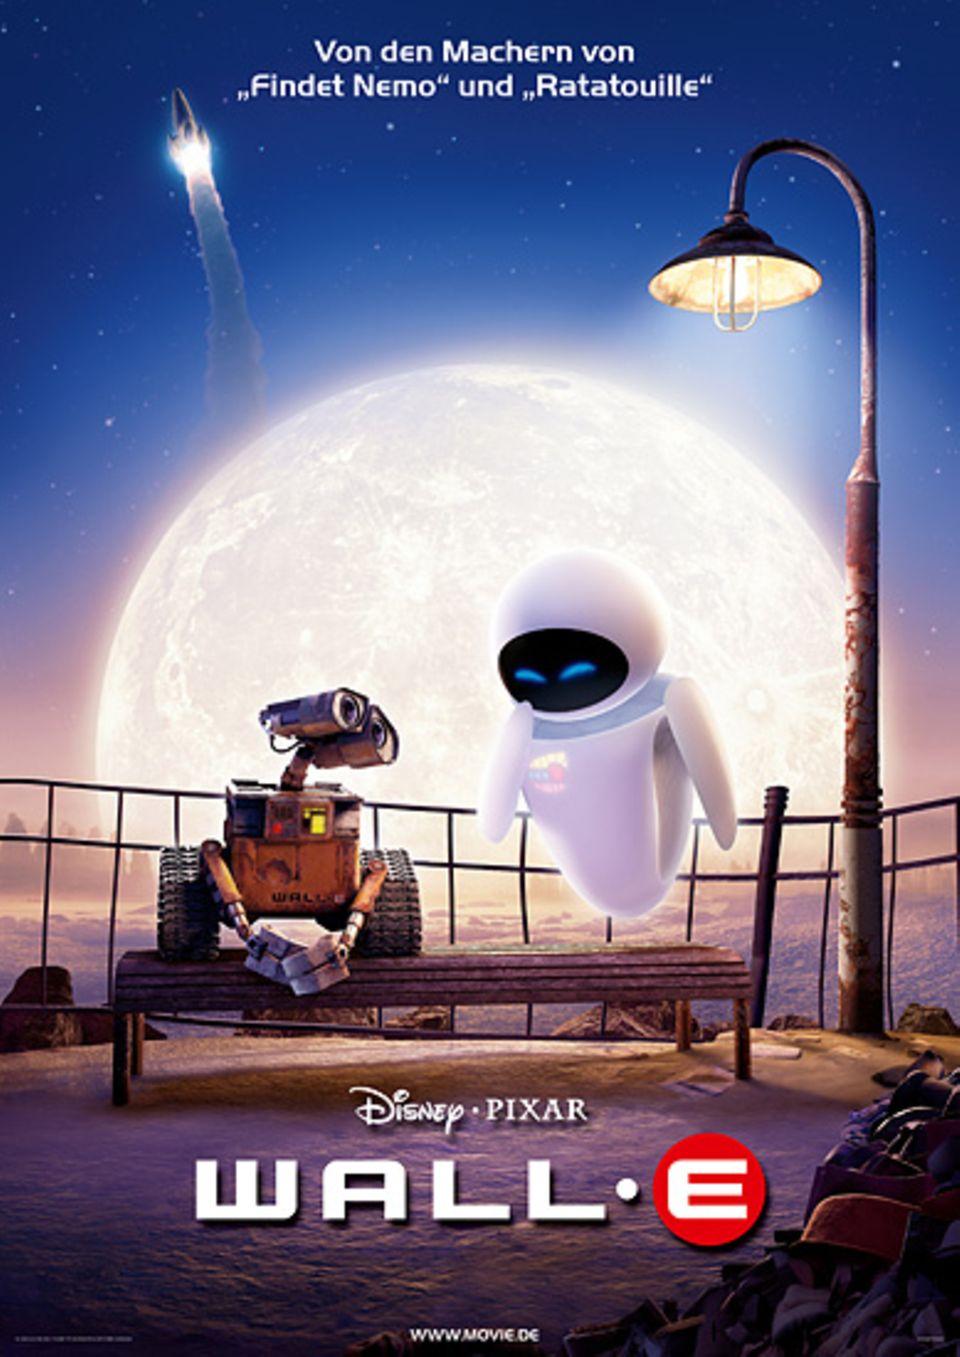 Film: Kinotipp: Wall-E